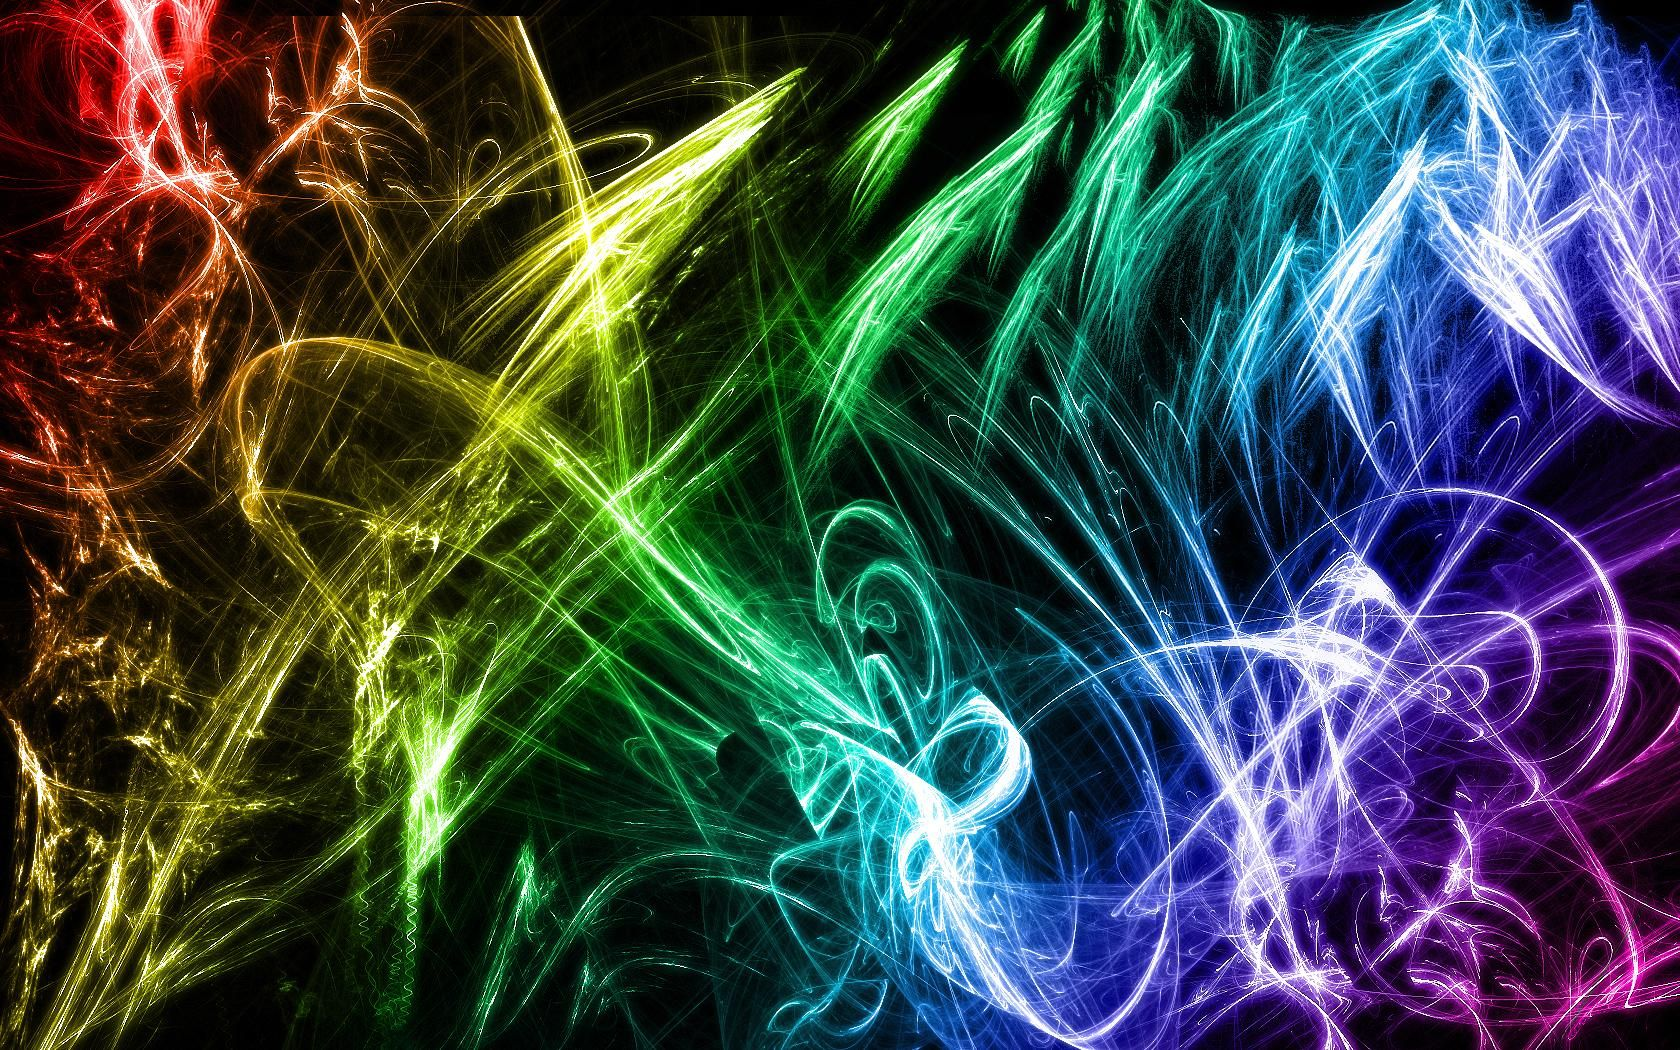 Abstract Explosions Fantasy Art Digital Art Mouse Pad